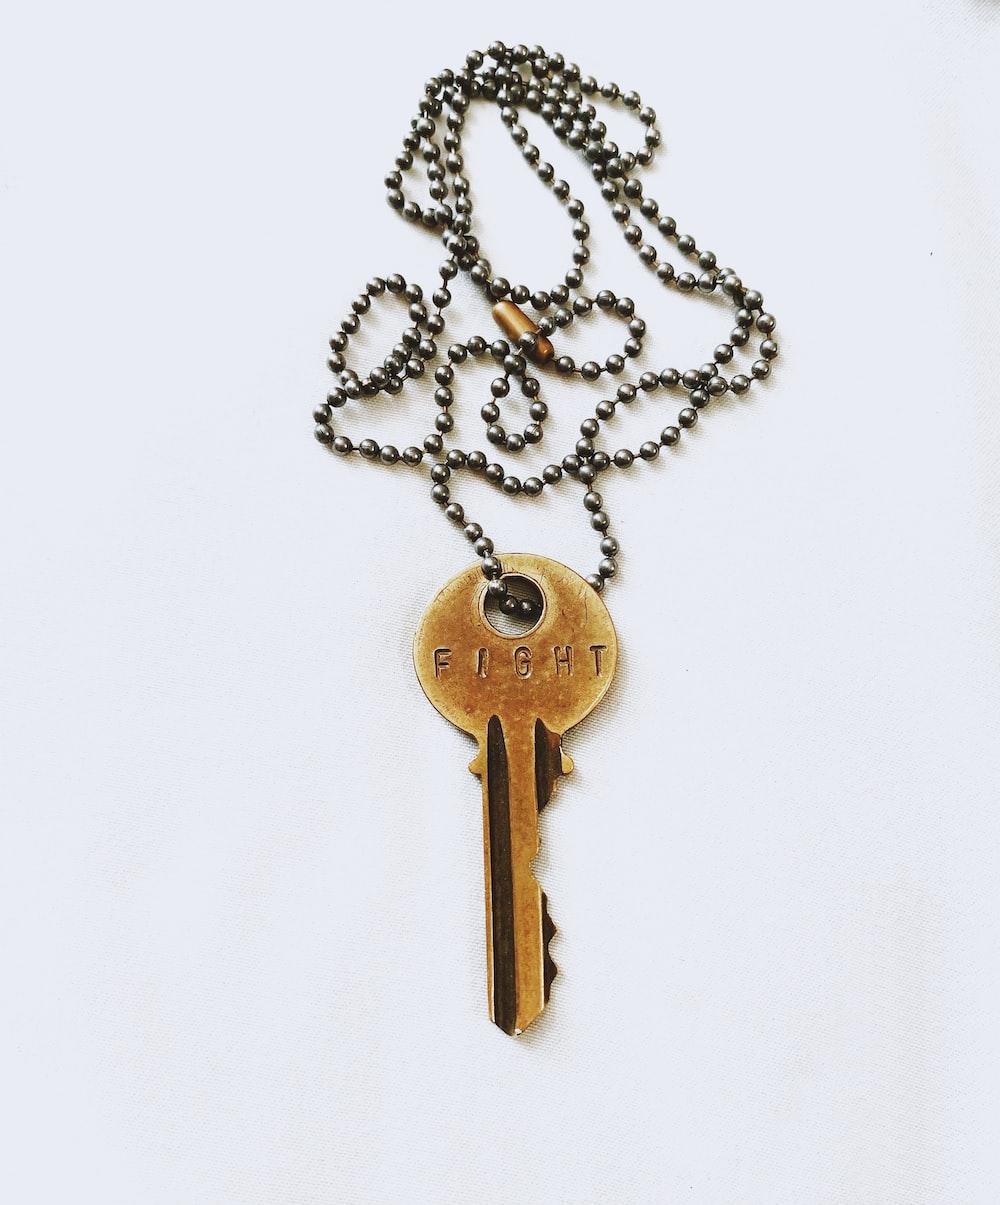 gray key fight pendant necklace on white background